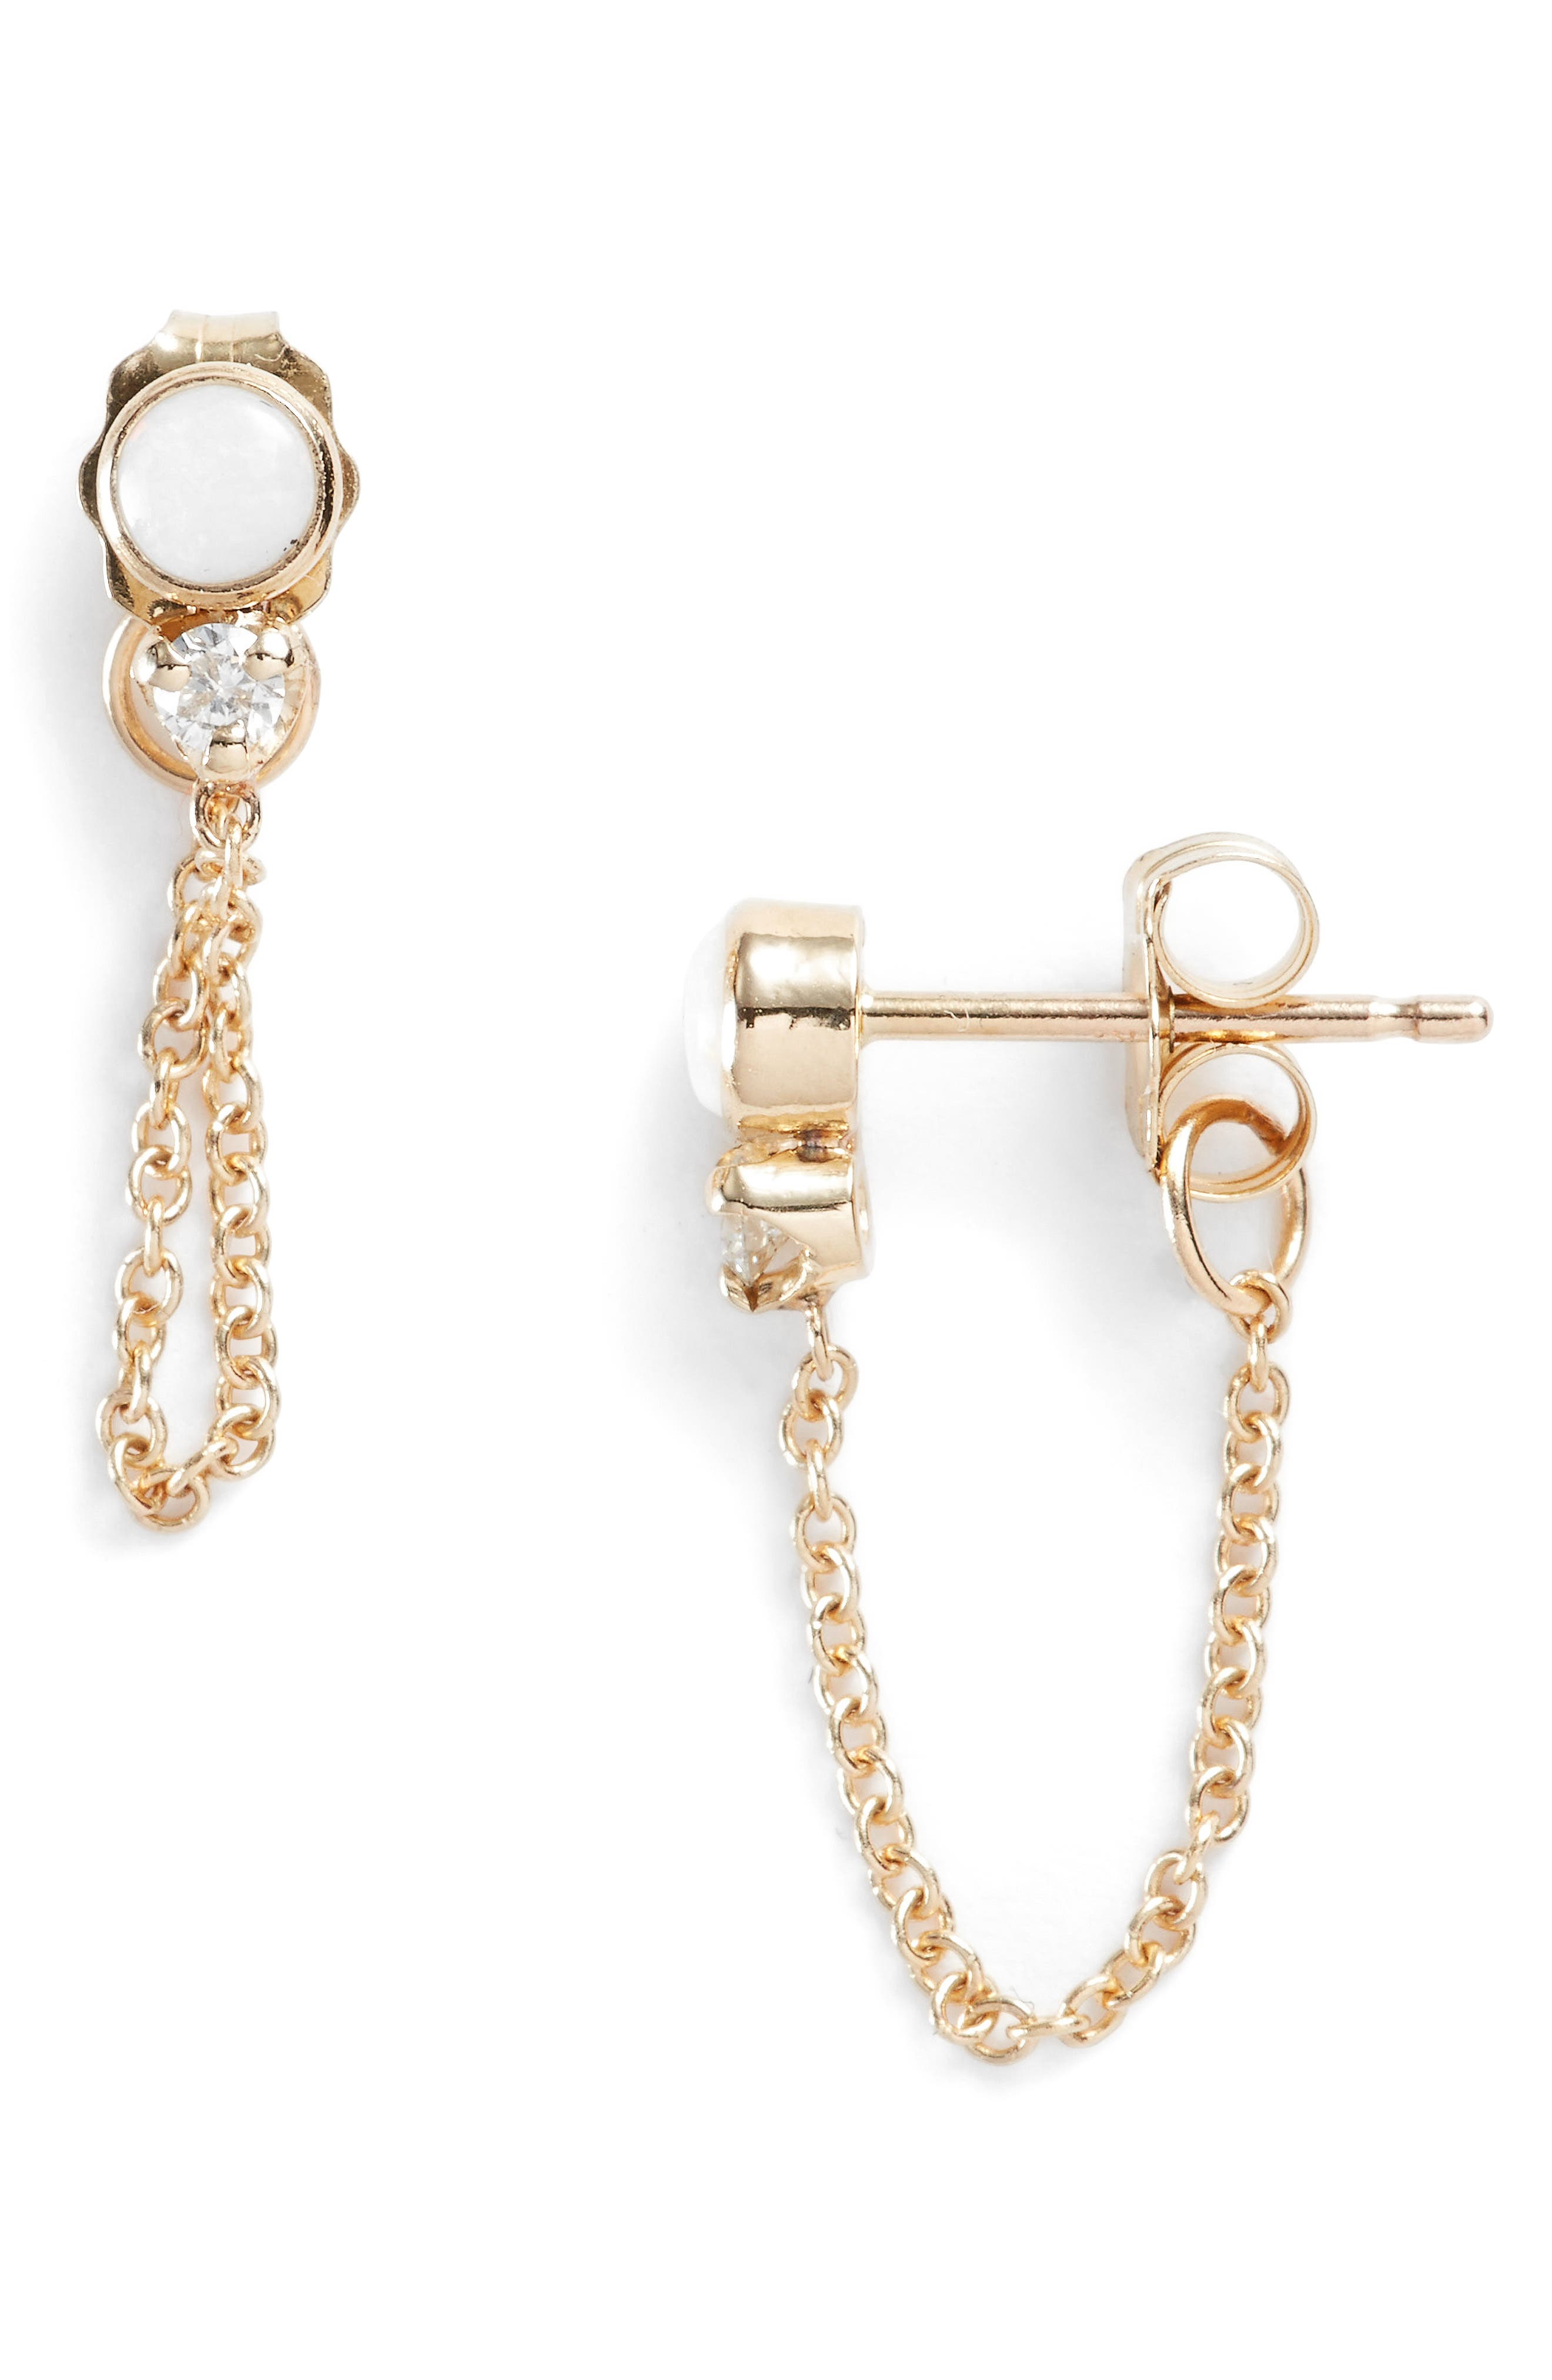 Diamond & Opal Front Back Earrings,                         Main,                         color, YELLOW GOLD/ OPAL